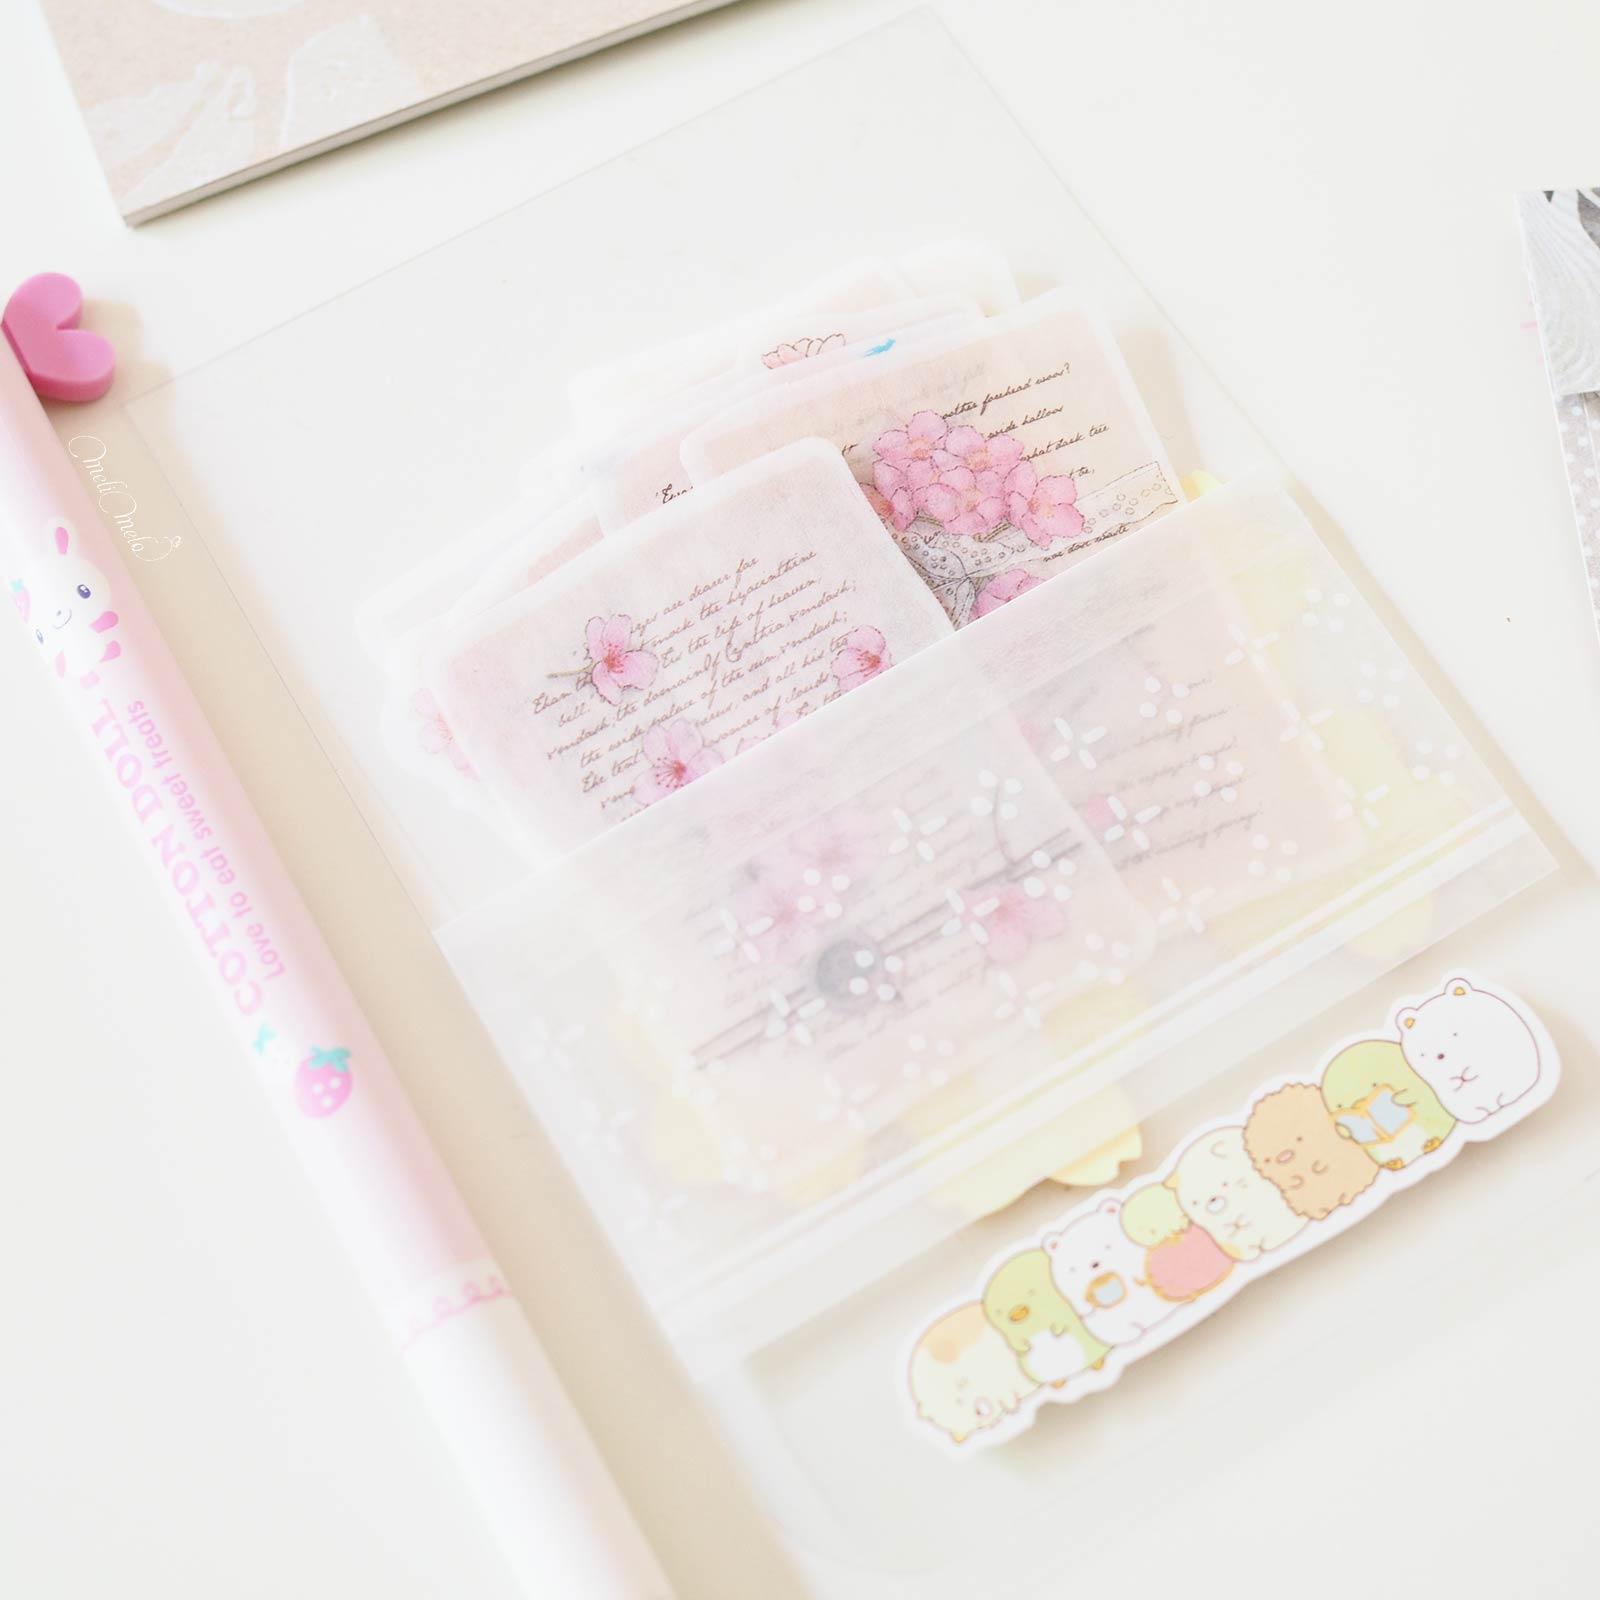 mini-stickers-sakura-fleurs-cerisiers-japon-sumikko-gurashi-yummy-laboutiquedemelimelo